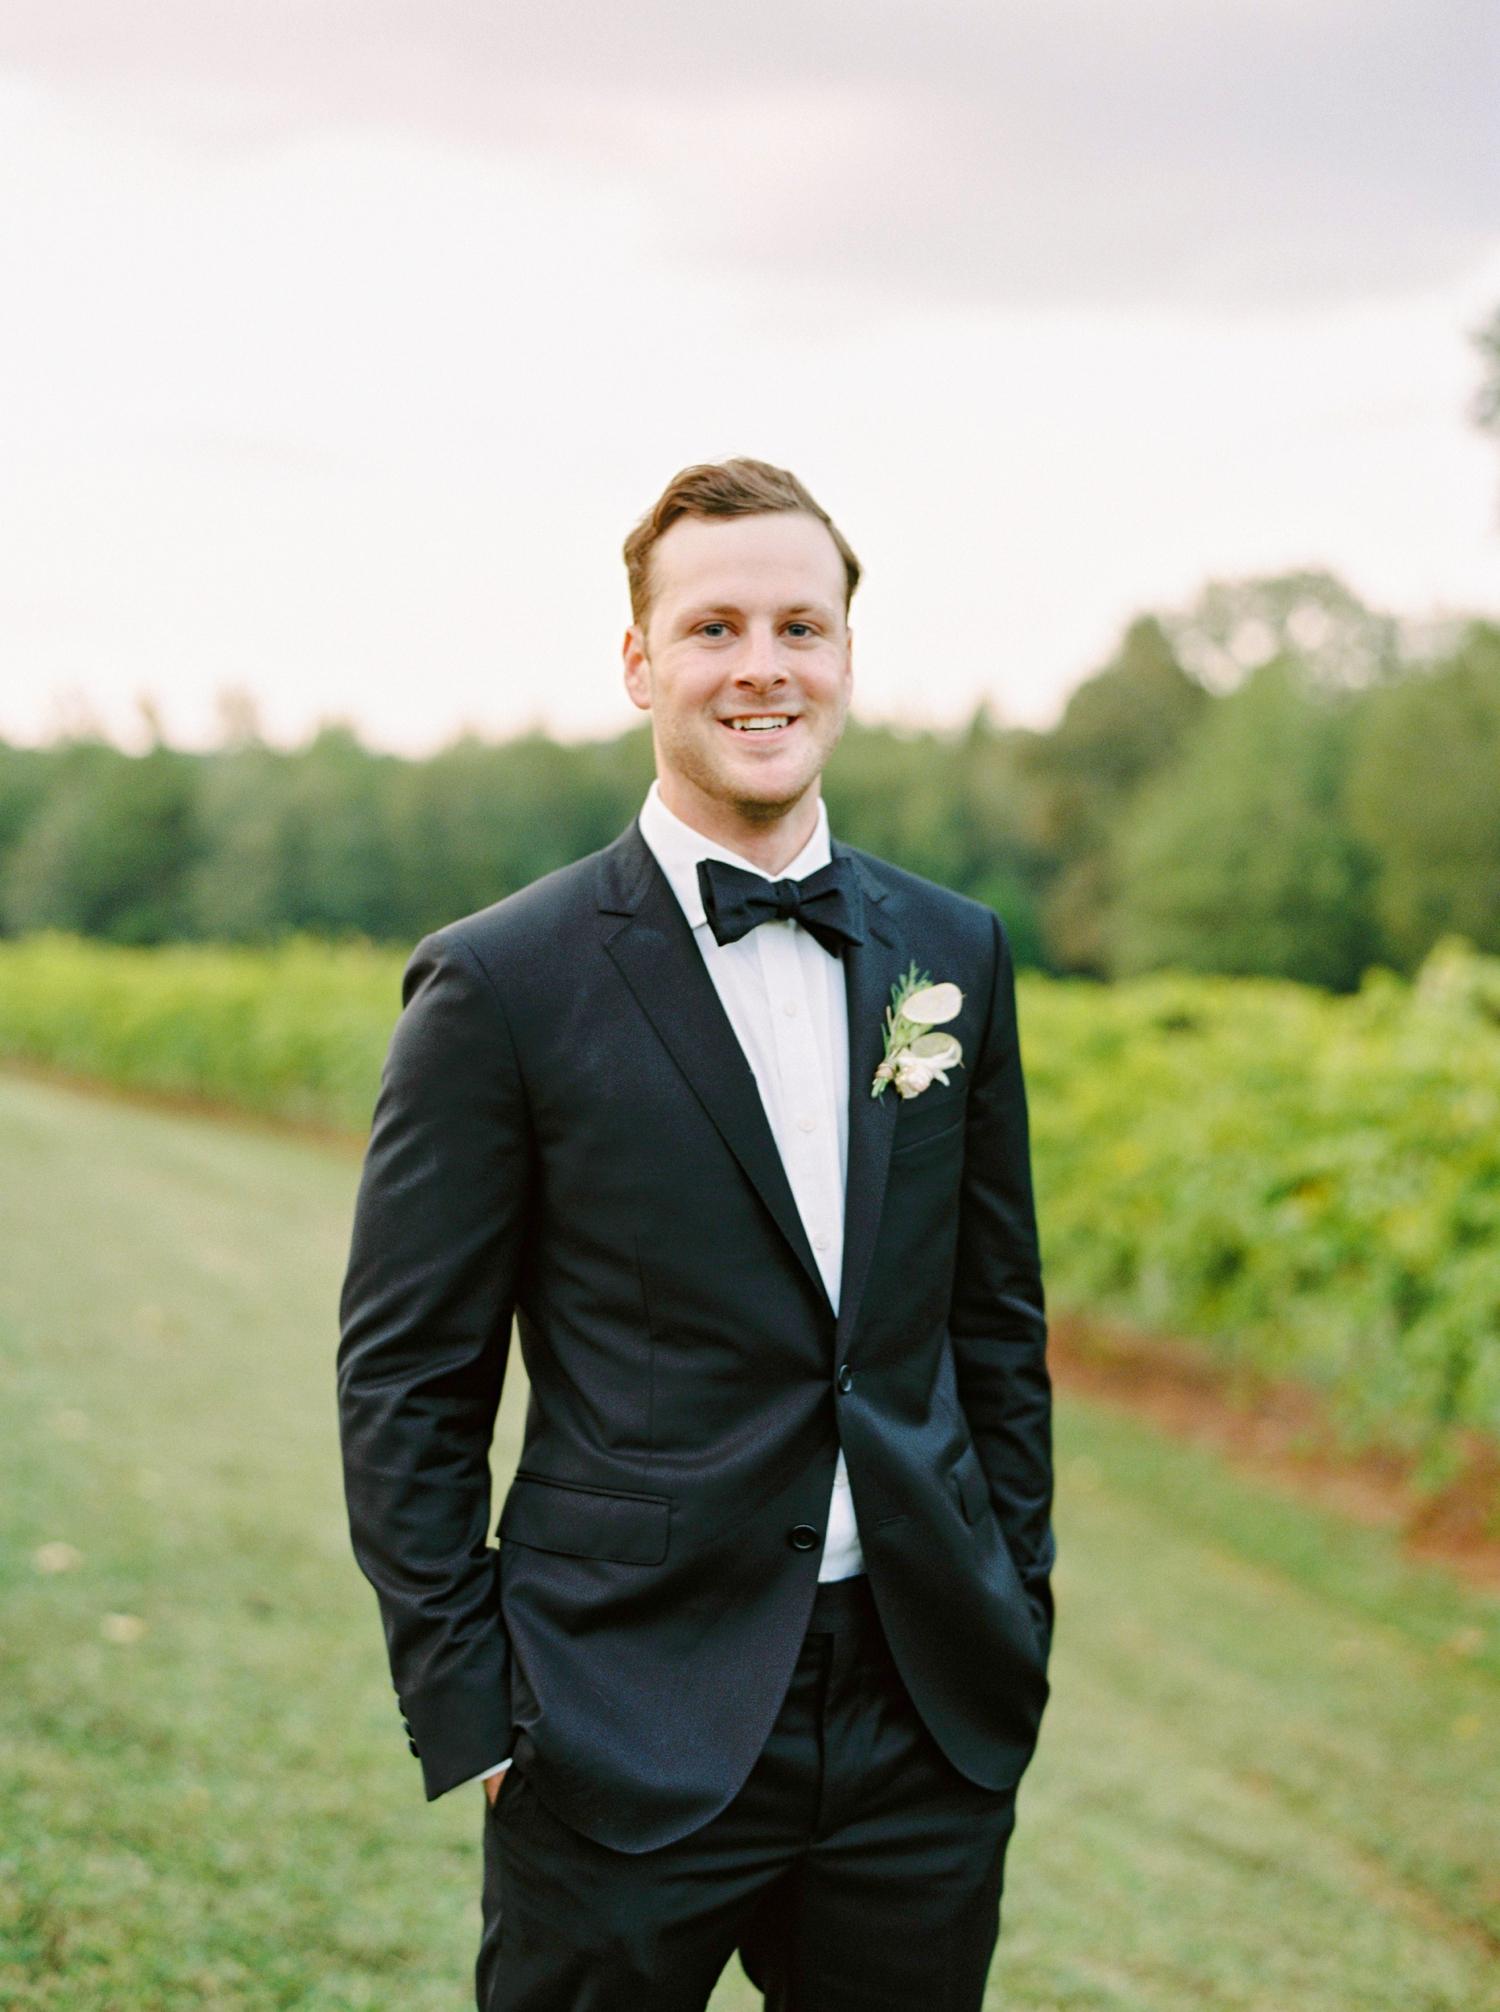 Calgary wedding photographers | georgia wedding photographers | fine art film | Justine Milton Photography | georgia wedding | groom portraits | bouquet | pastel wedding inspiration